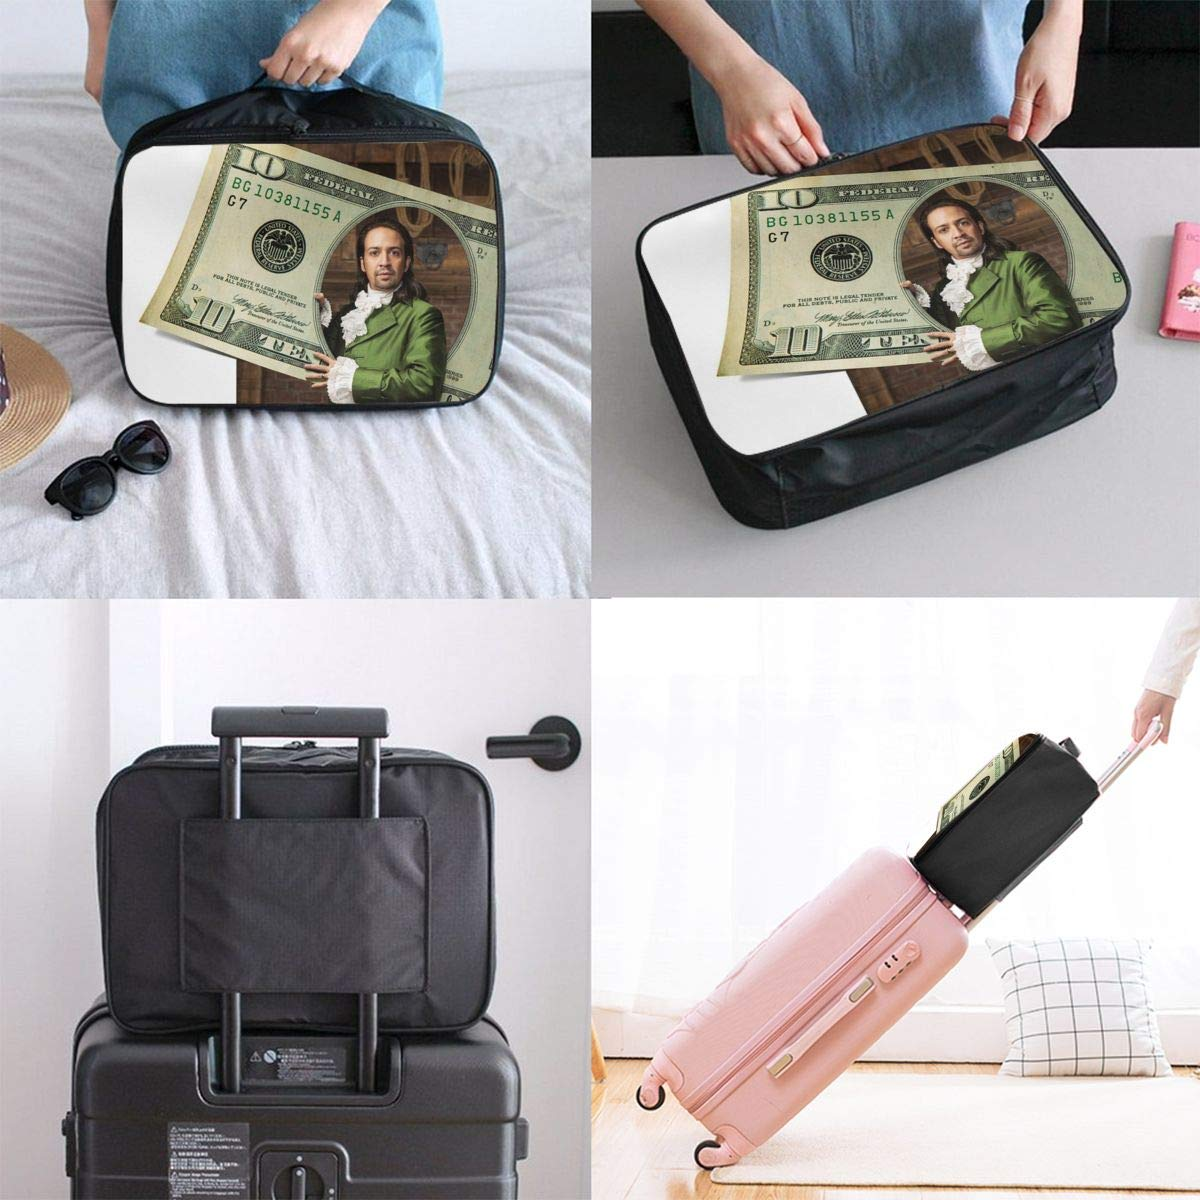 Rha-psodic Ham-ilton American Music Customize Casual Portable Travel Bag Suitcase Storage Bag Luggage Packing Tote Bag Trolley Bag